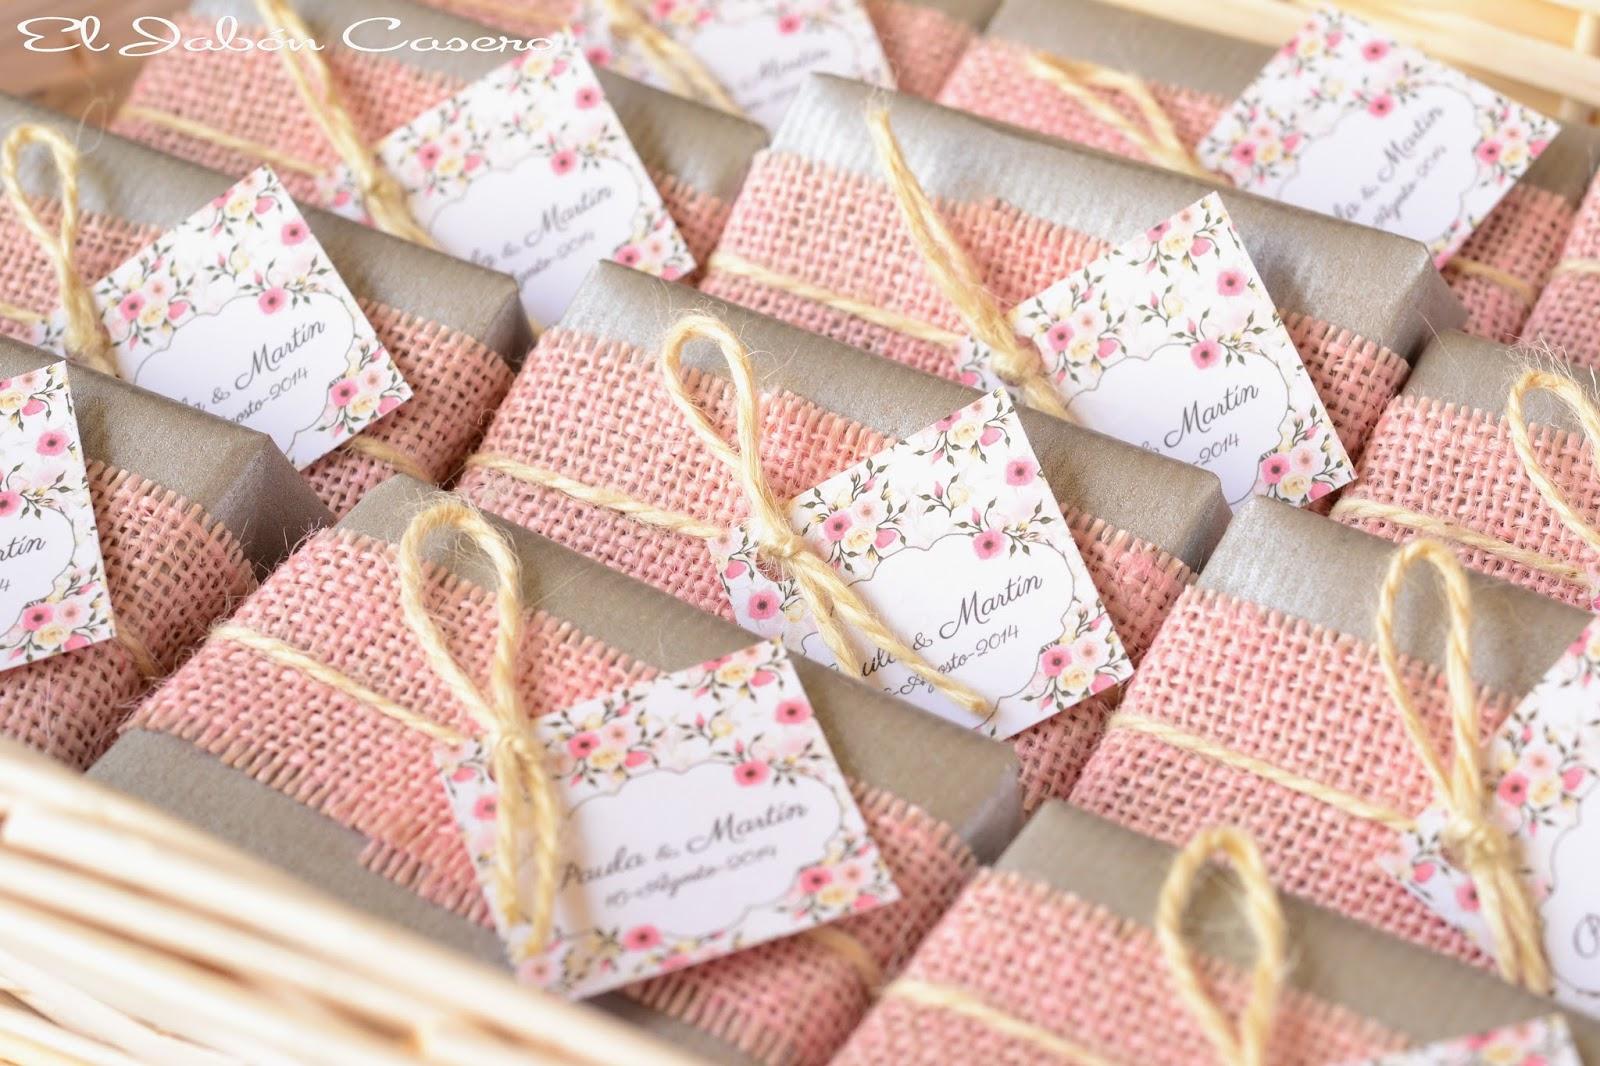 jabones naturales para bodas en rosa